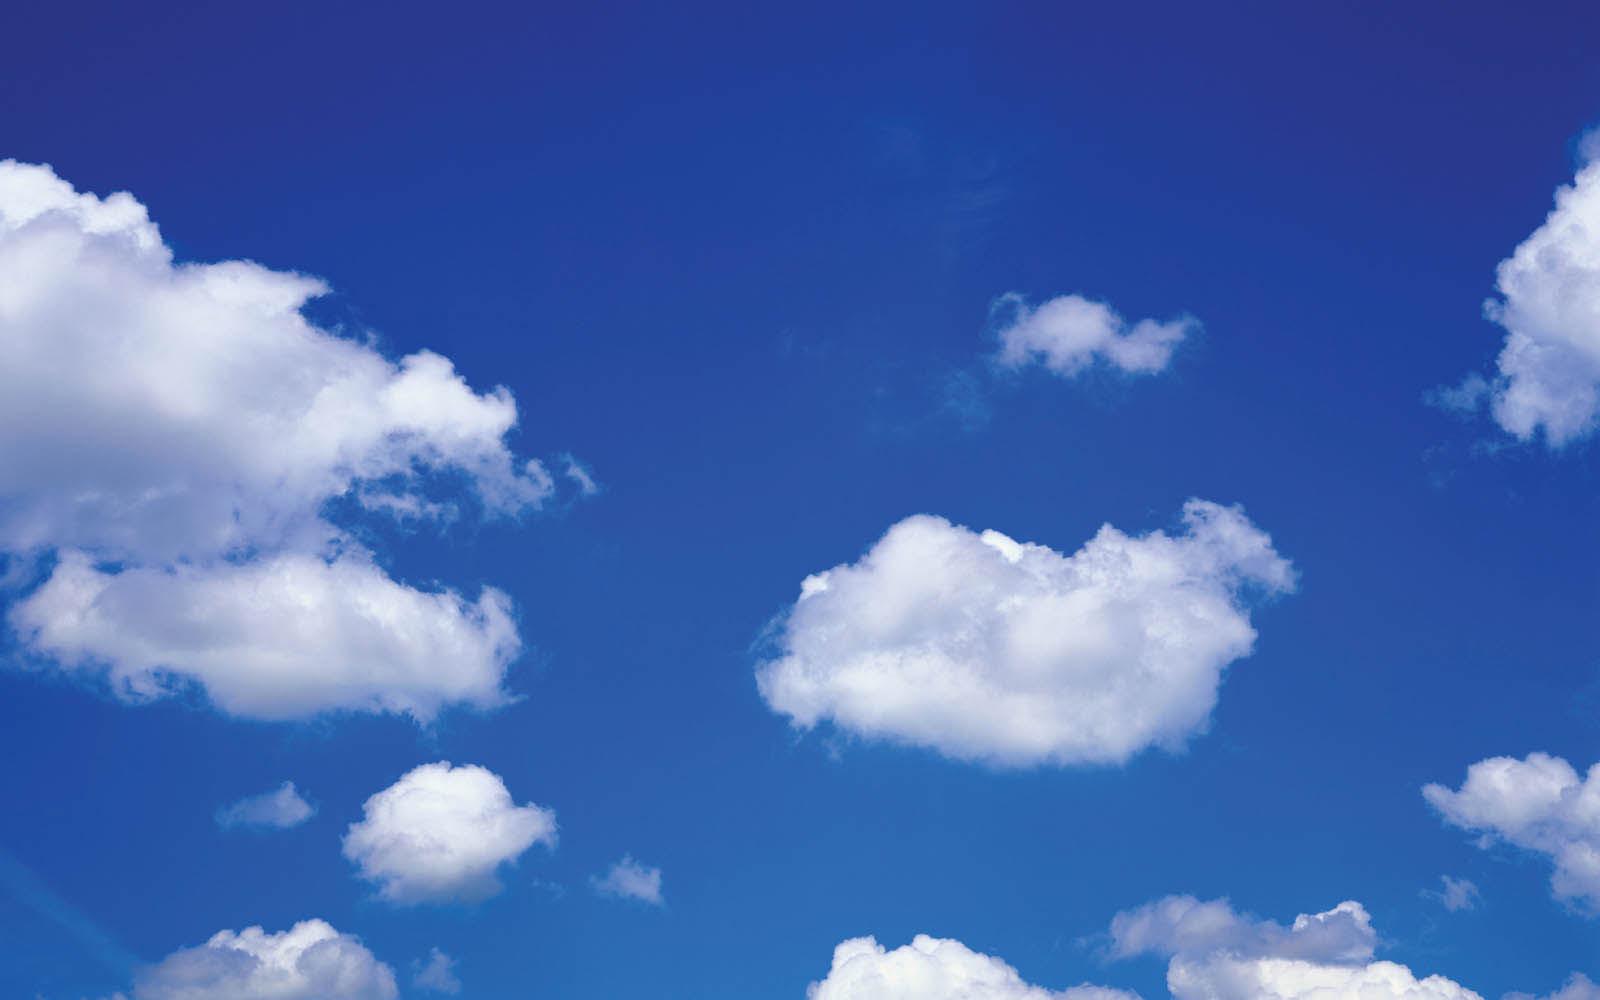 blue sky wallpapers blue sky desktop wallpapers blue sky backgrounds 1600x1000